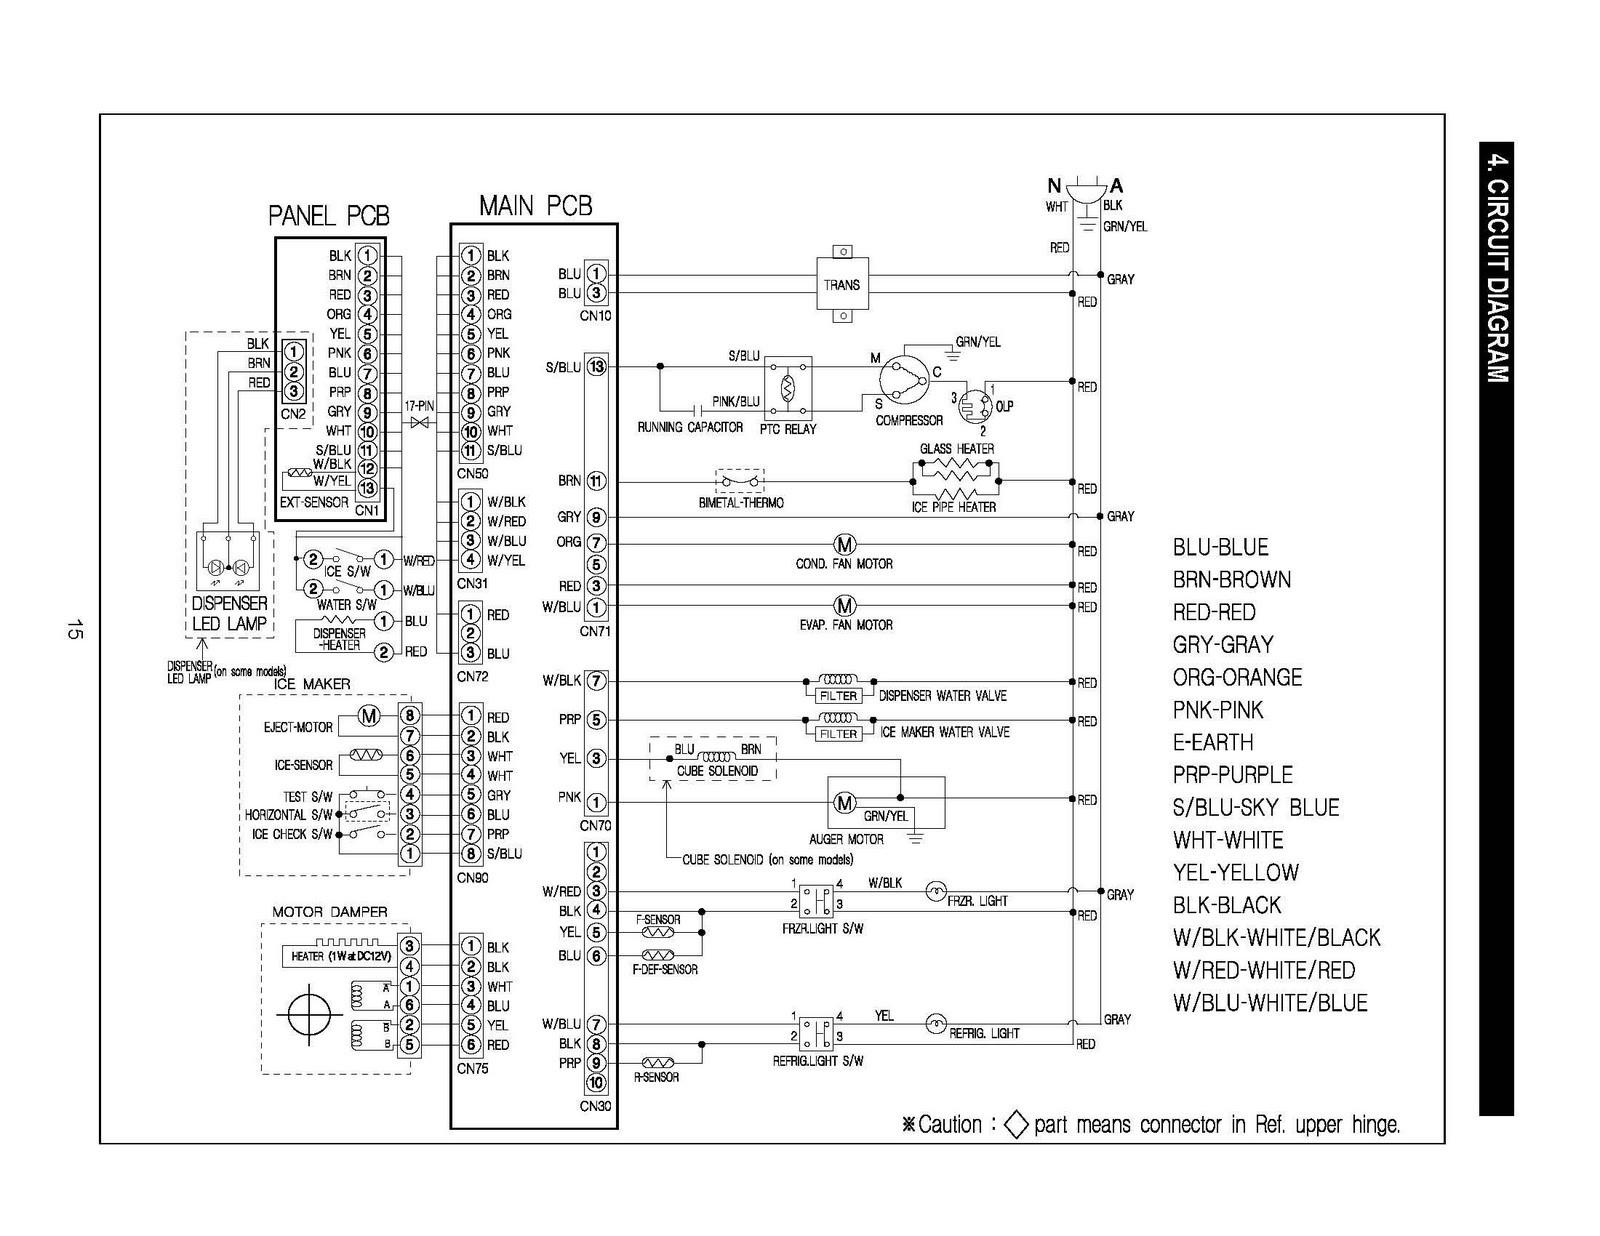 True Freezer T 23F Wiring Diagram Refrigeration Manual 13F At - True Freezer T 49F Wiring Diagram